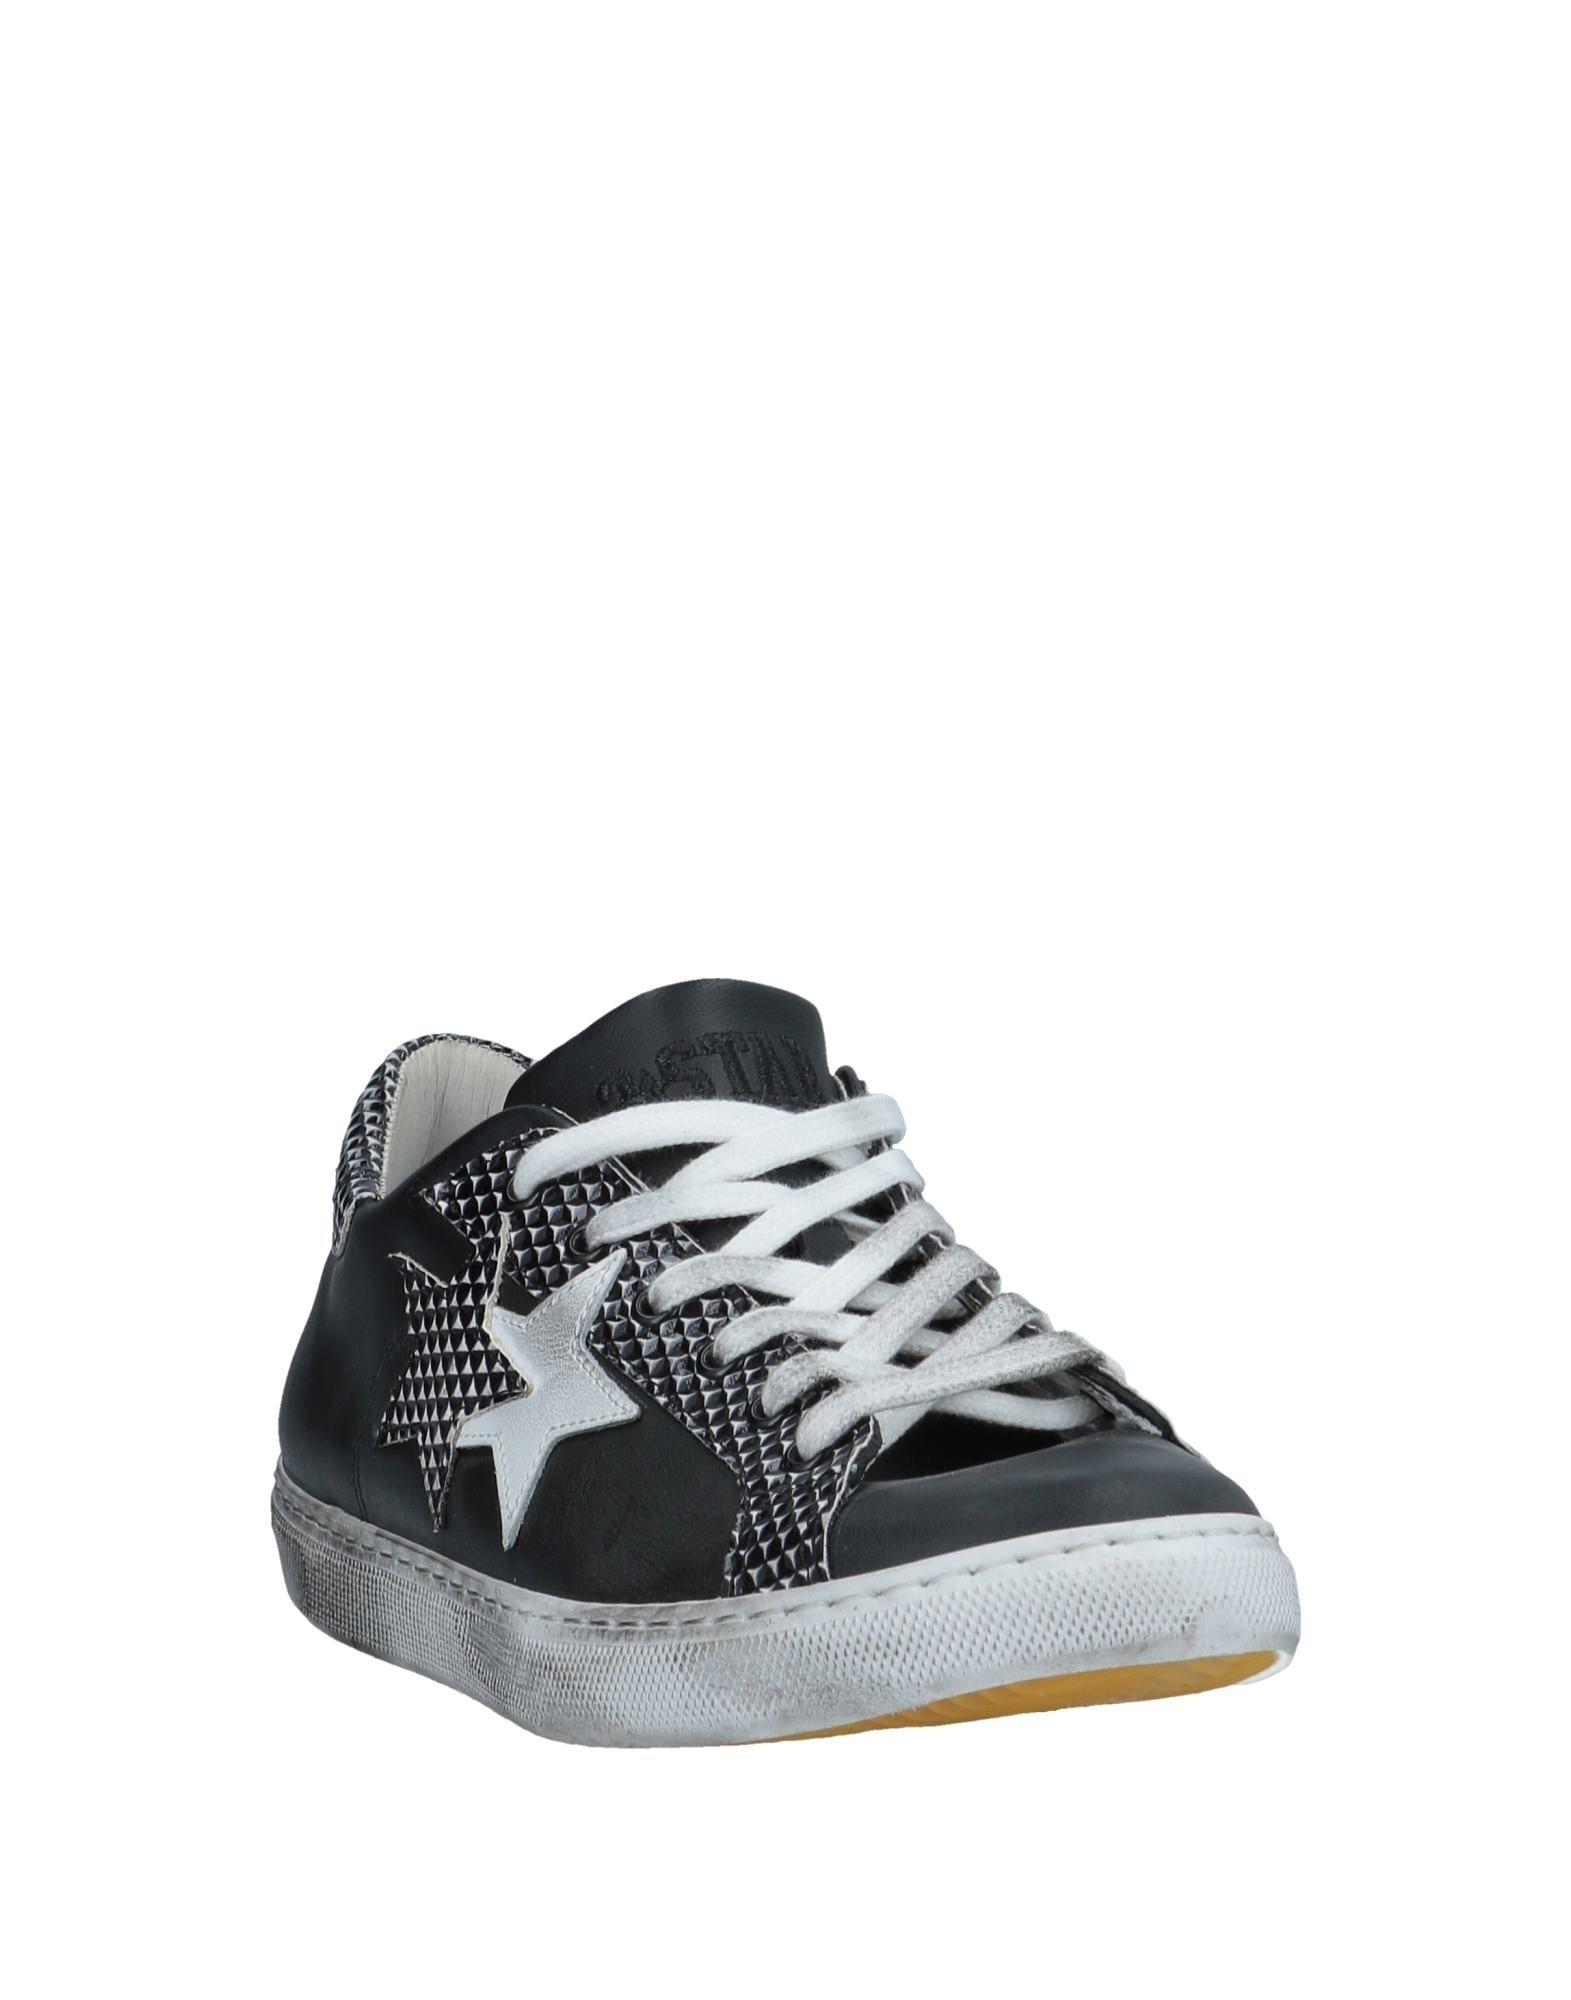 2Star Sneakers Damen  beliebte 11549907SM Gute Qualität beliebte  Schuhe 890745